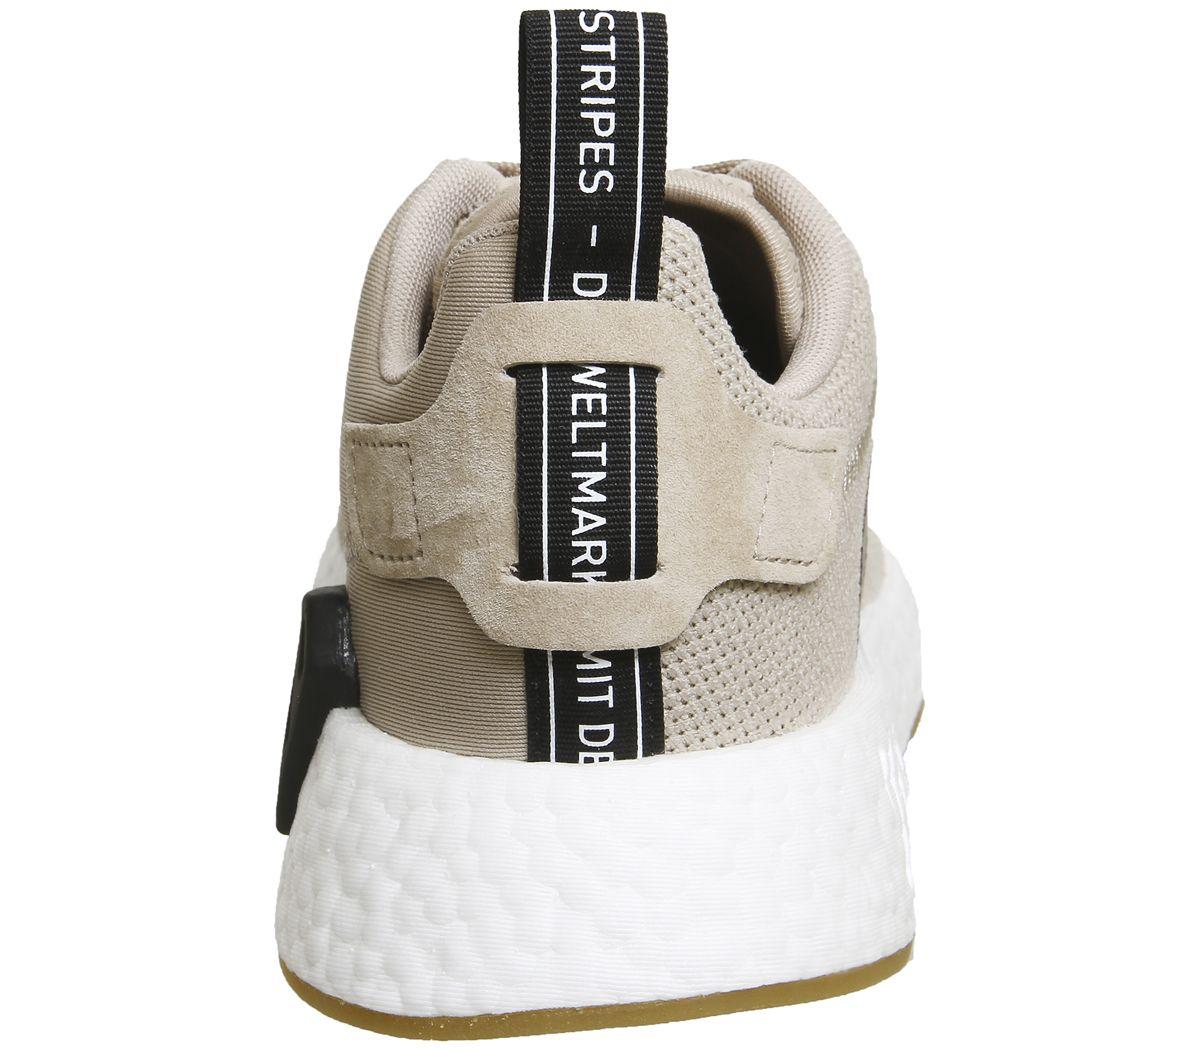 Adidas da Donna Nmd R2 R2 R2 Traccia Khaki Marroneee Scarpe da Ginnastica f86d82